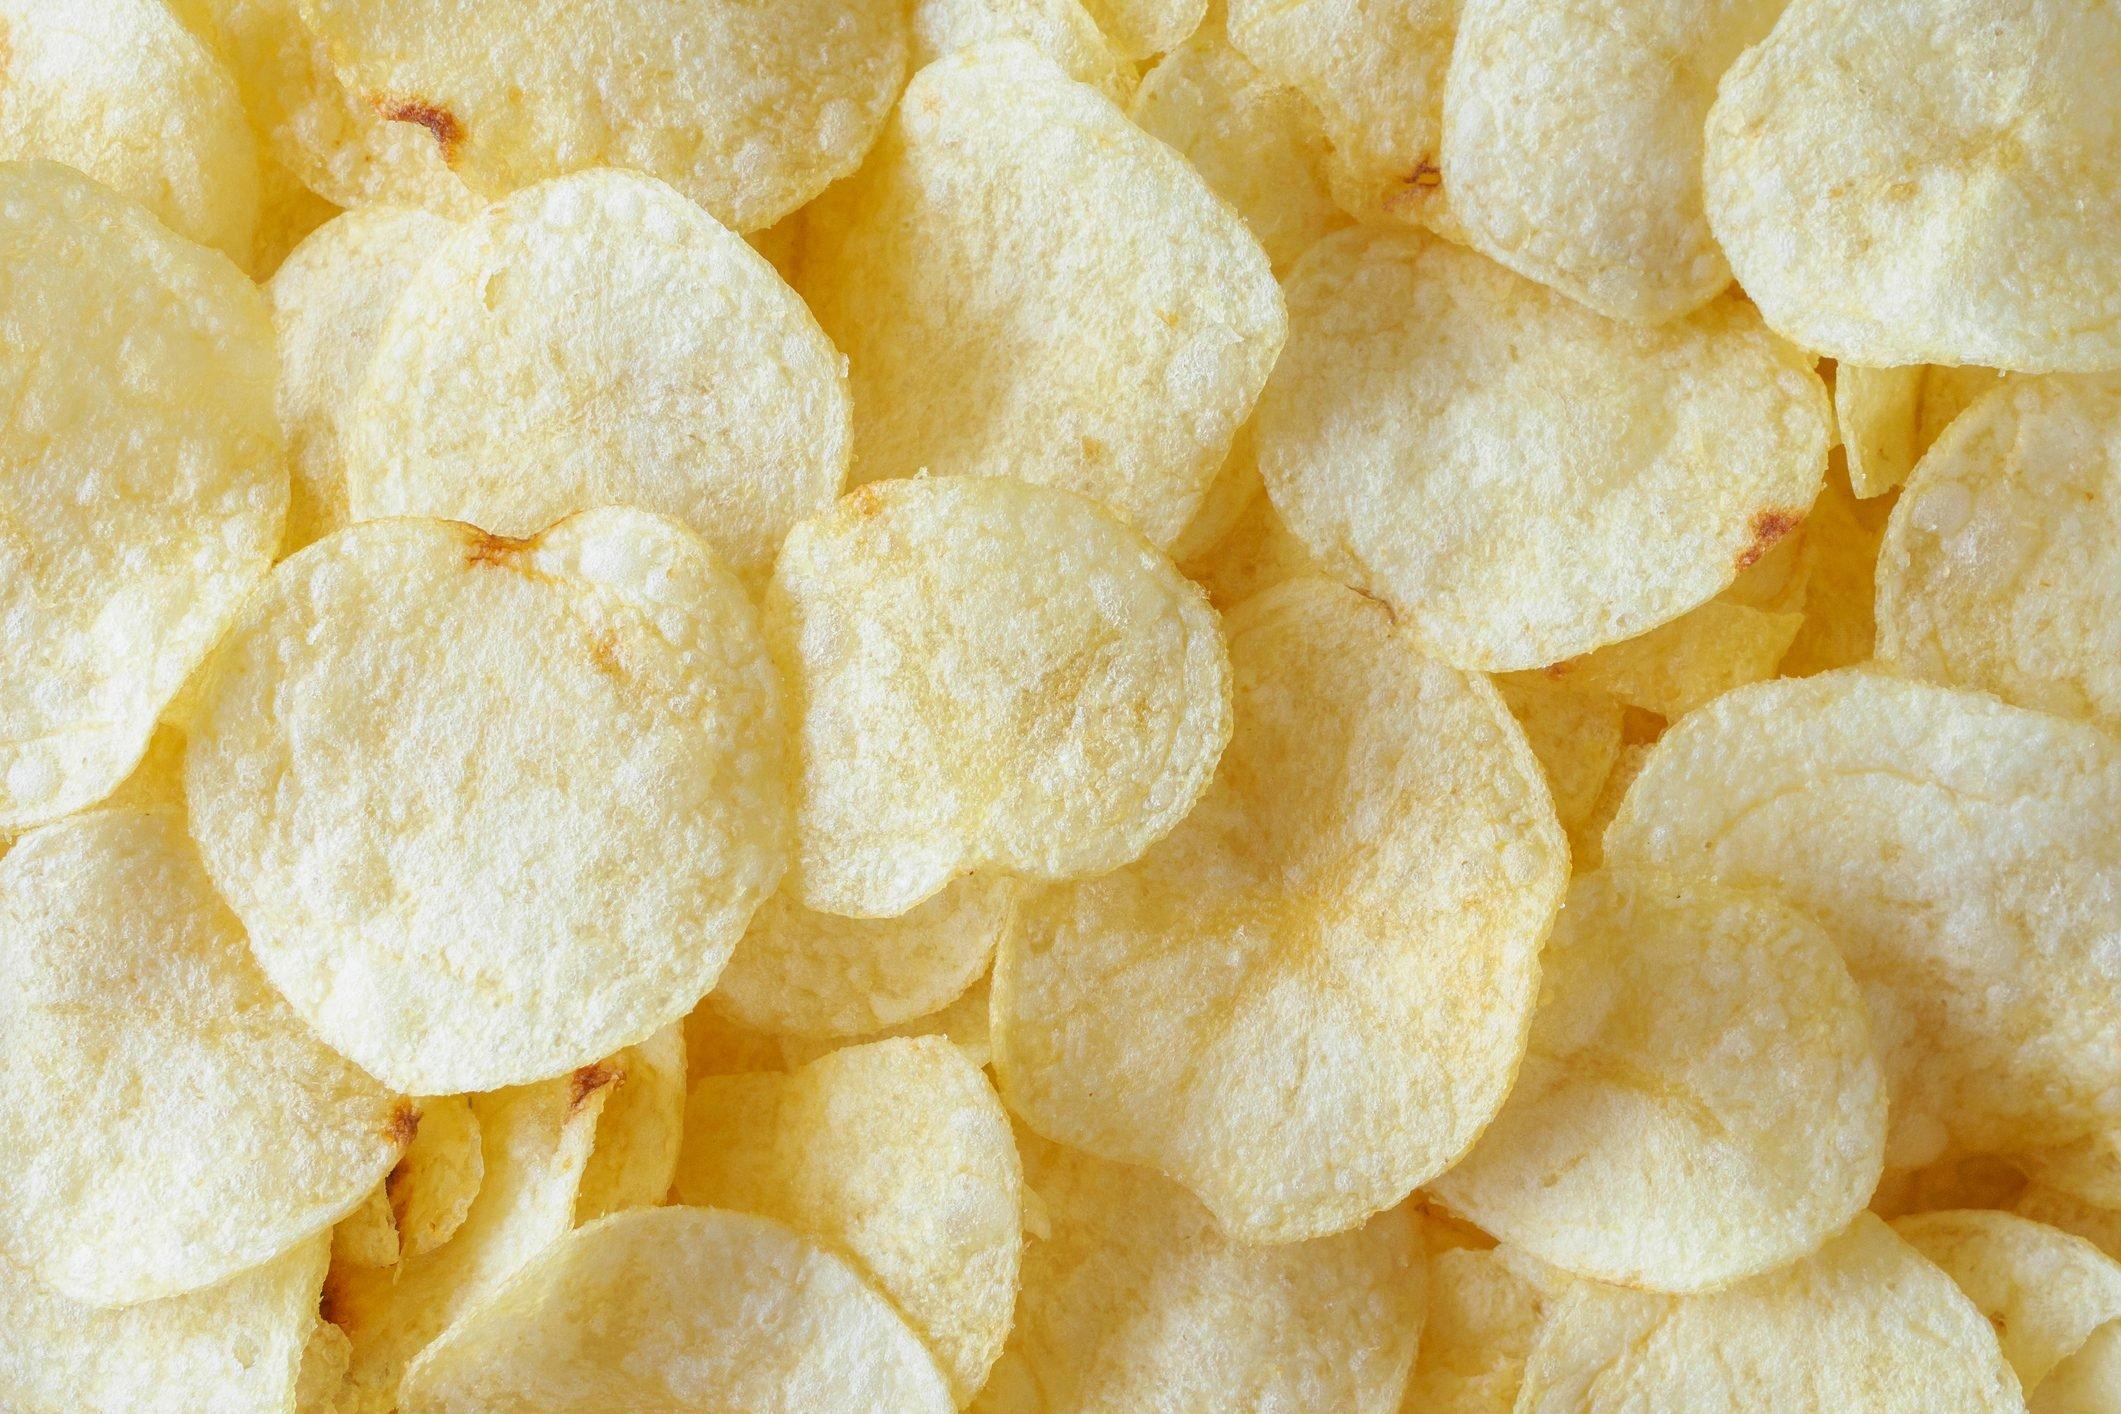 crispy potato chips snack texture background